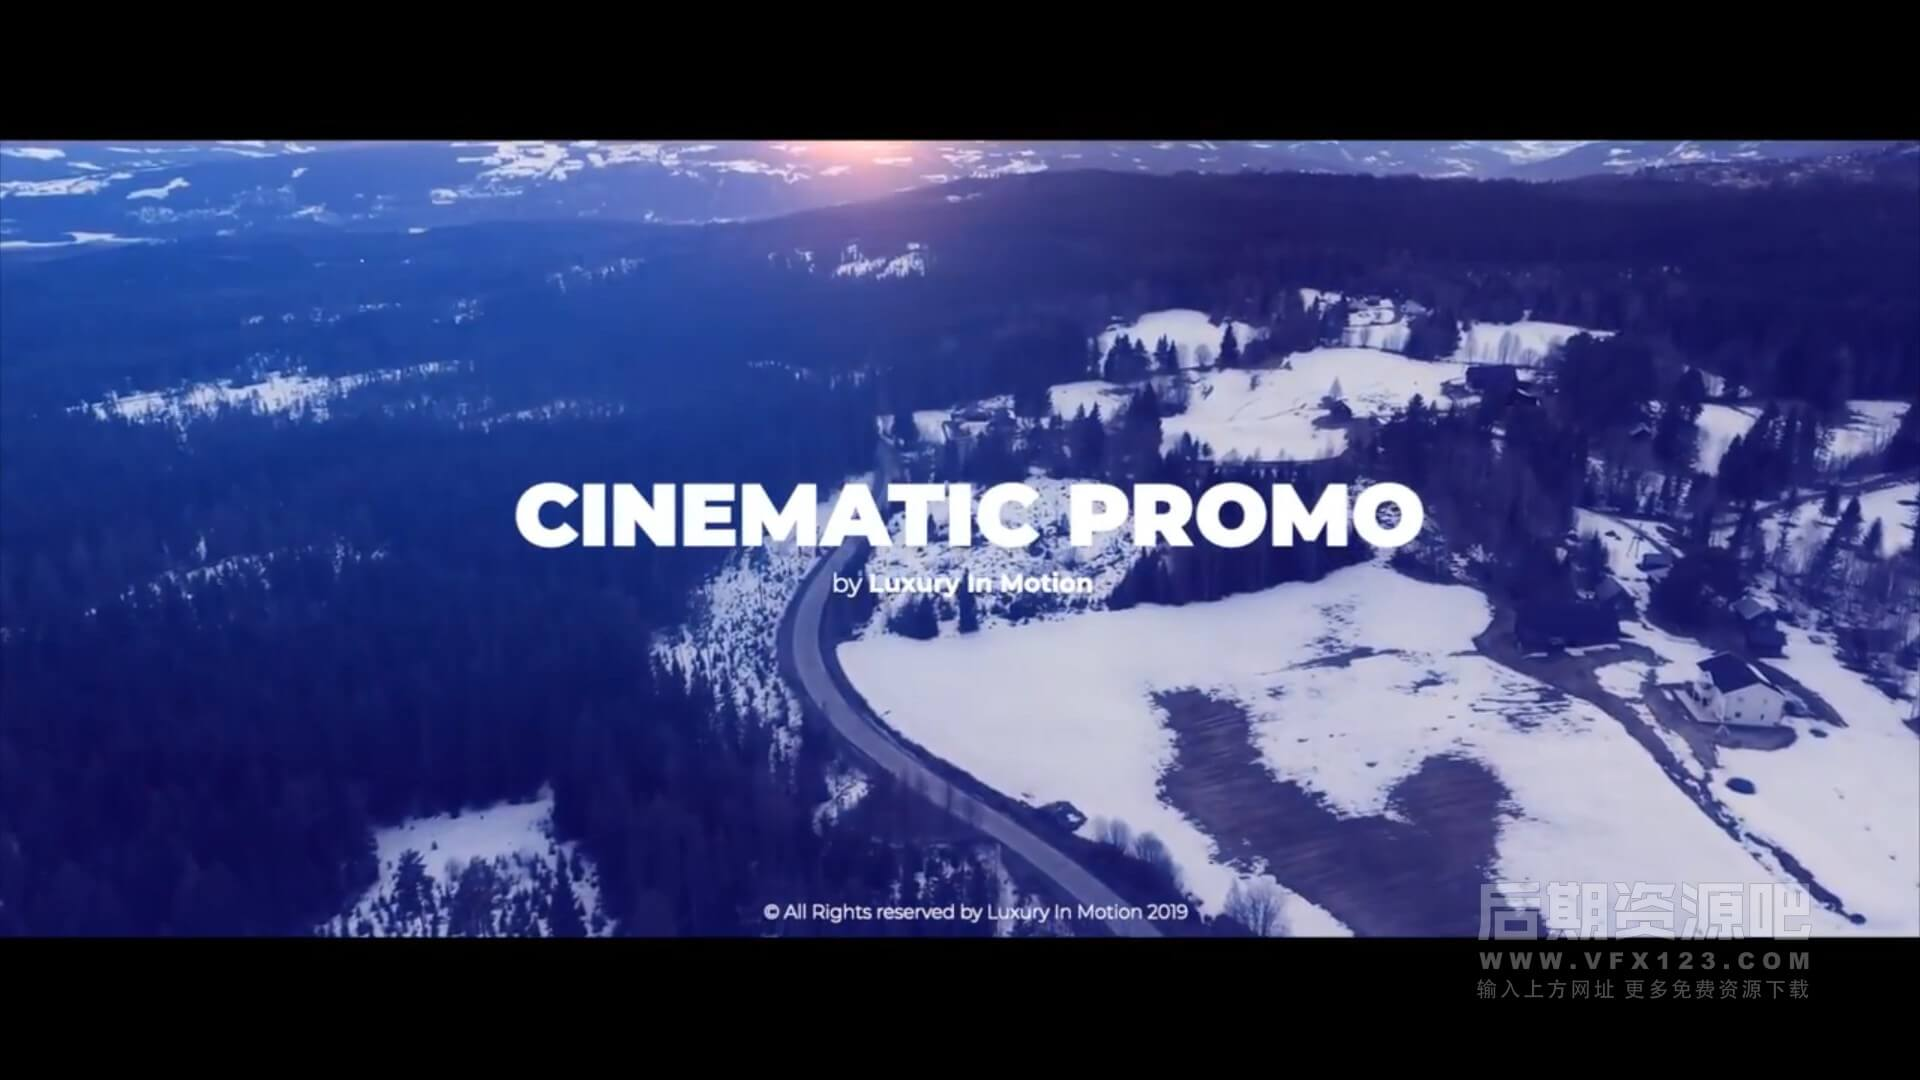 fcpx主题模板 通用电影预告片宣传片开场片头 Cinematic Promo